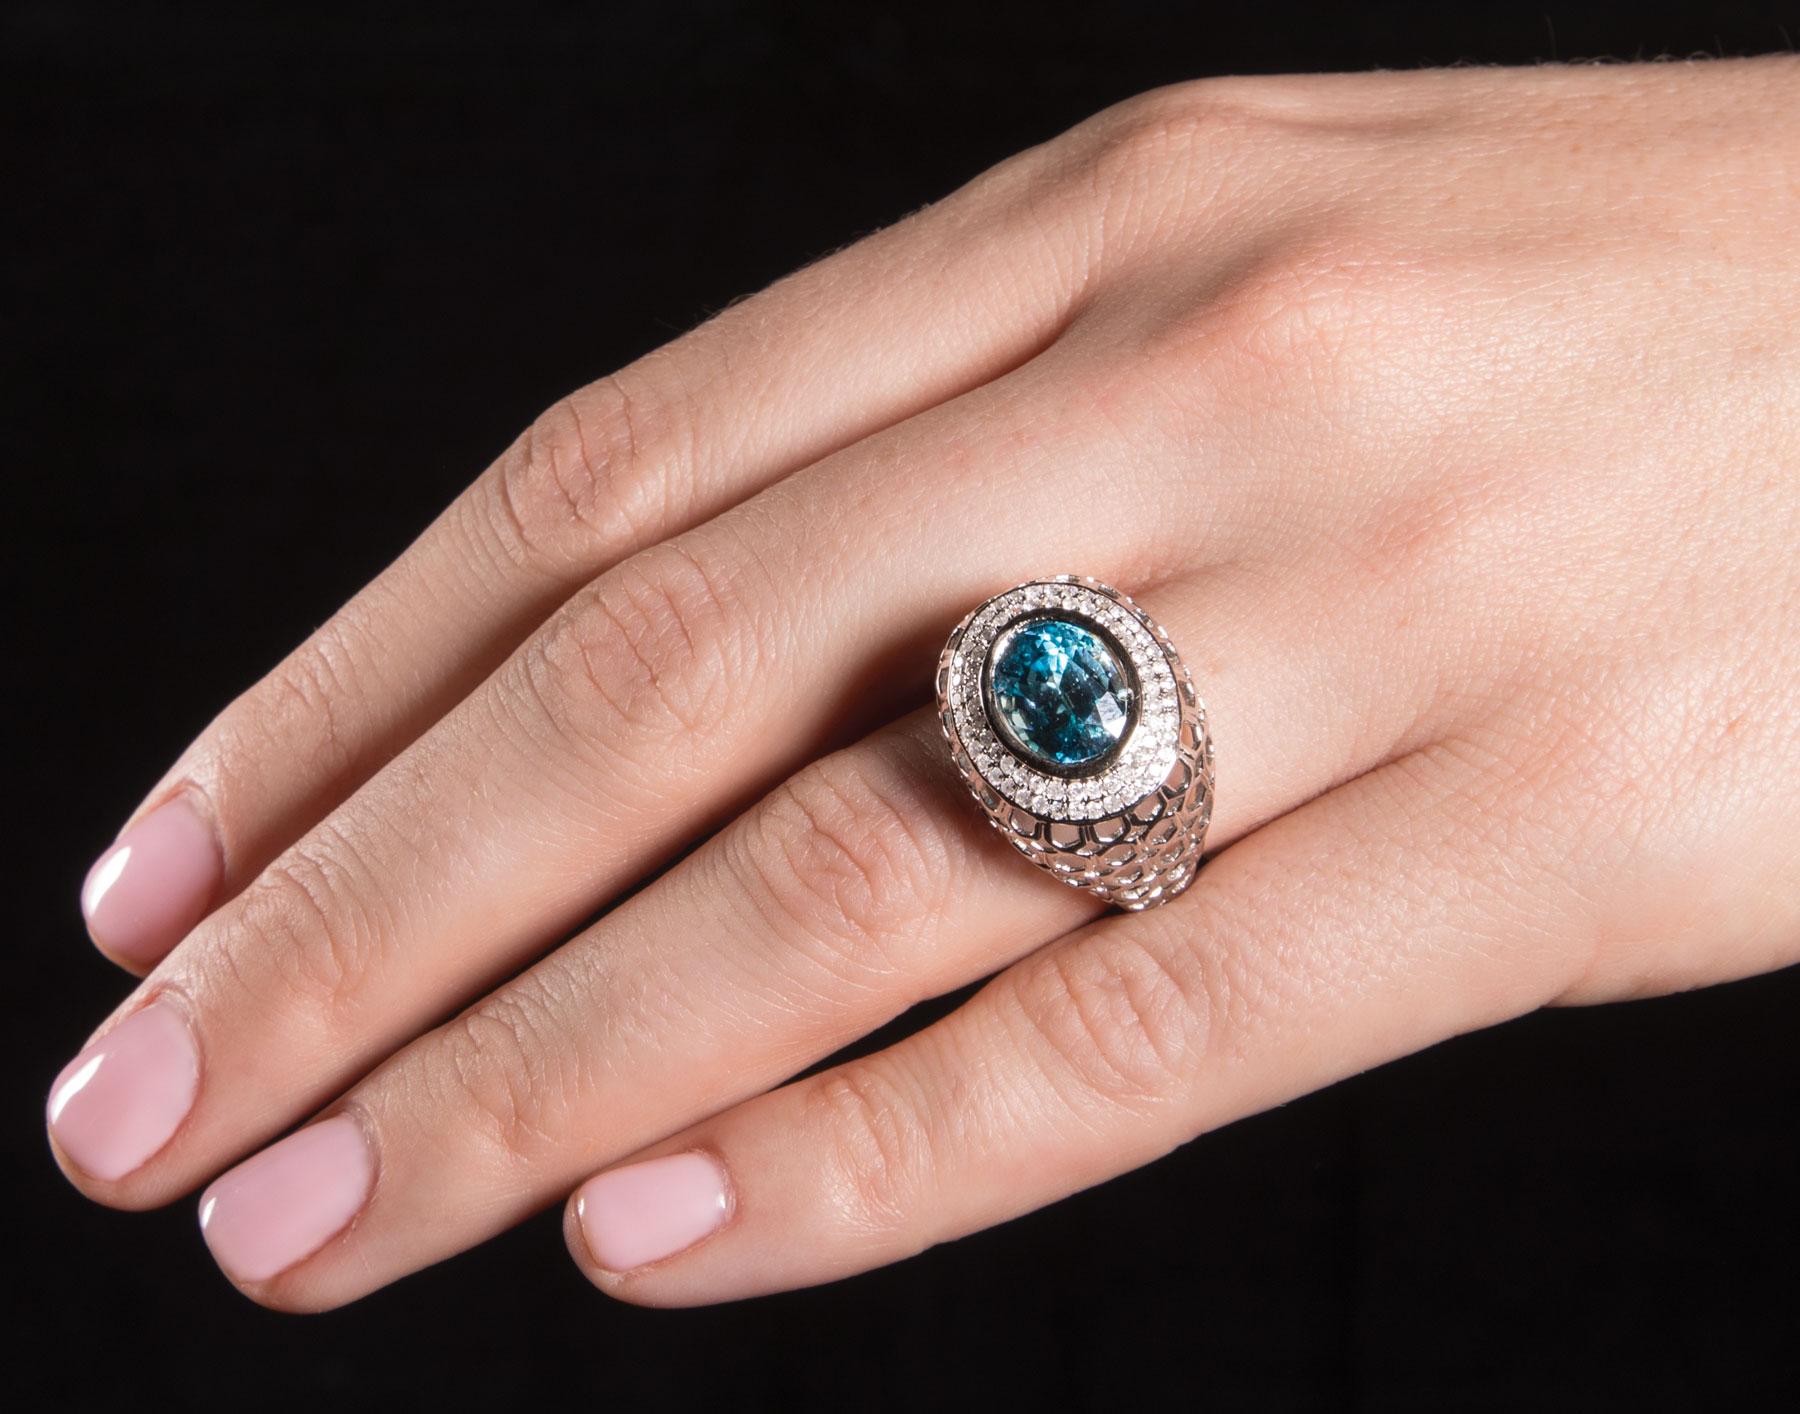 Lot 593 - 14 kt. White Gold, Blue Zircon and Diamond Ring , bezel set oval cut zircon, approx. 11.06 x 8.45